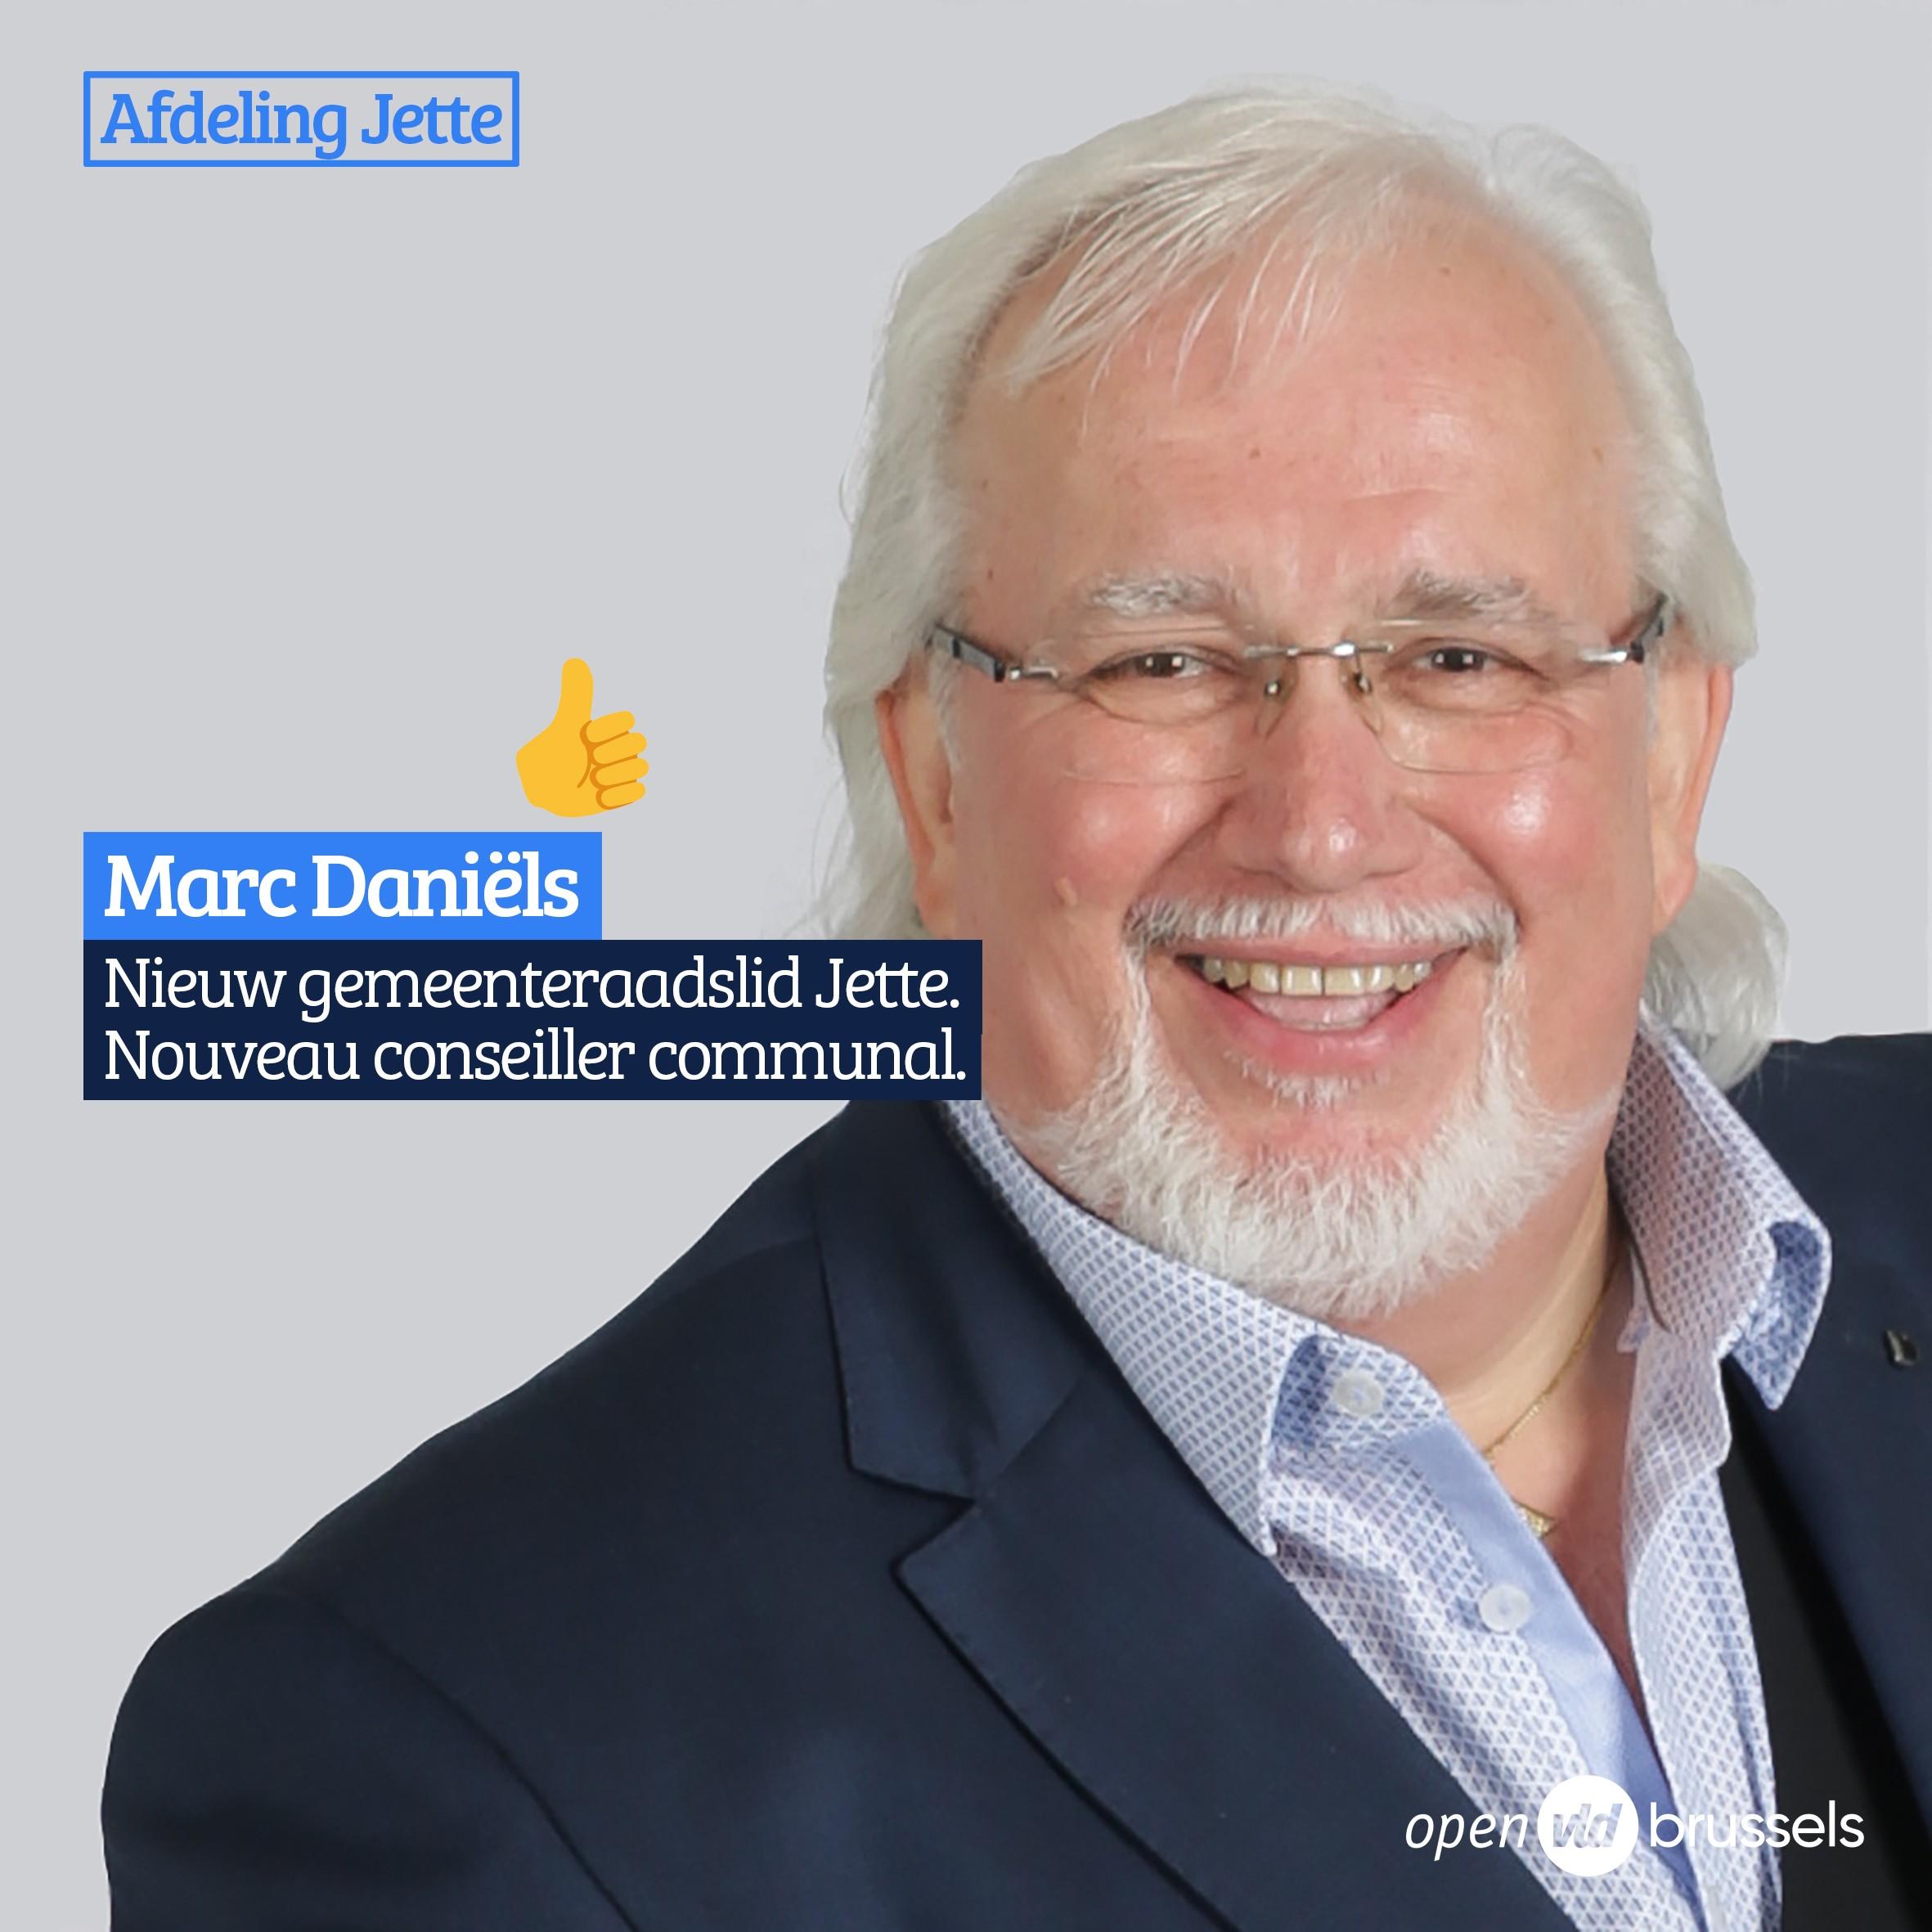 Marc Daniëls